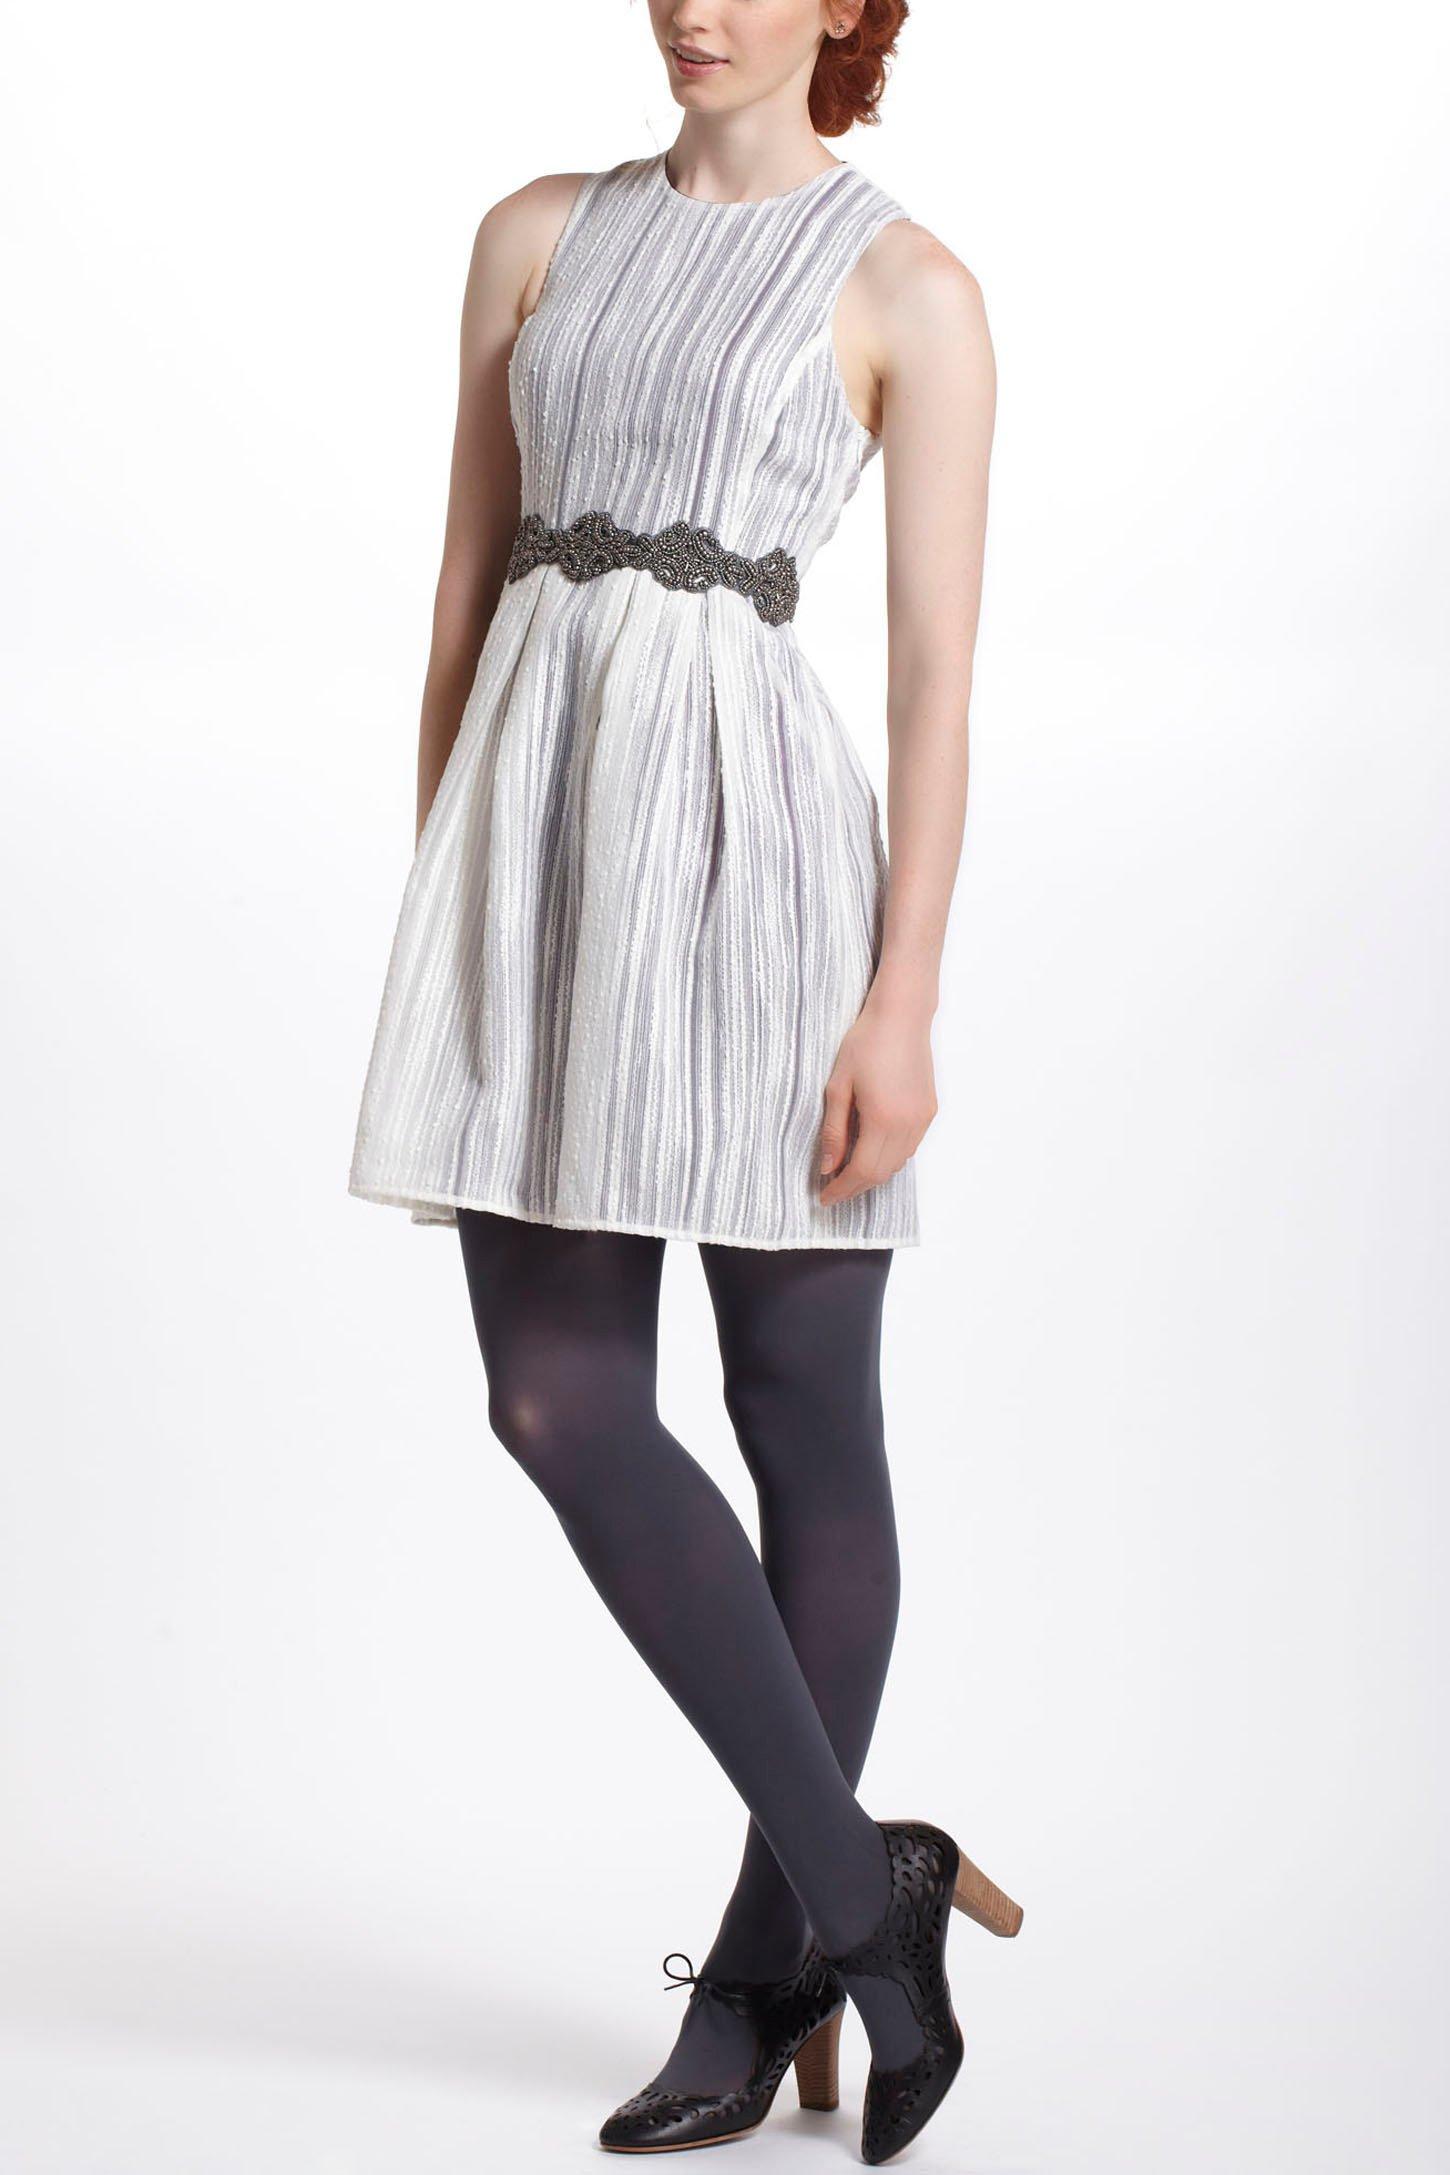 lyst anthropologie spun lace racerback dress in white